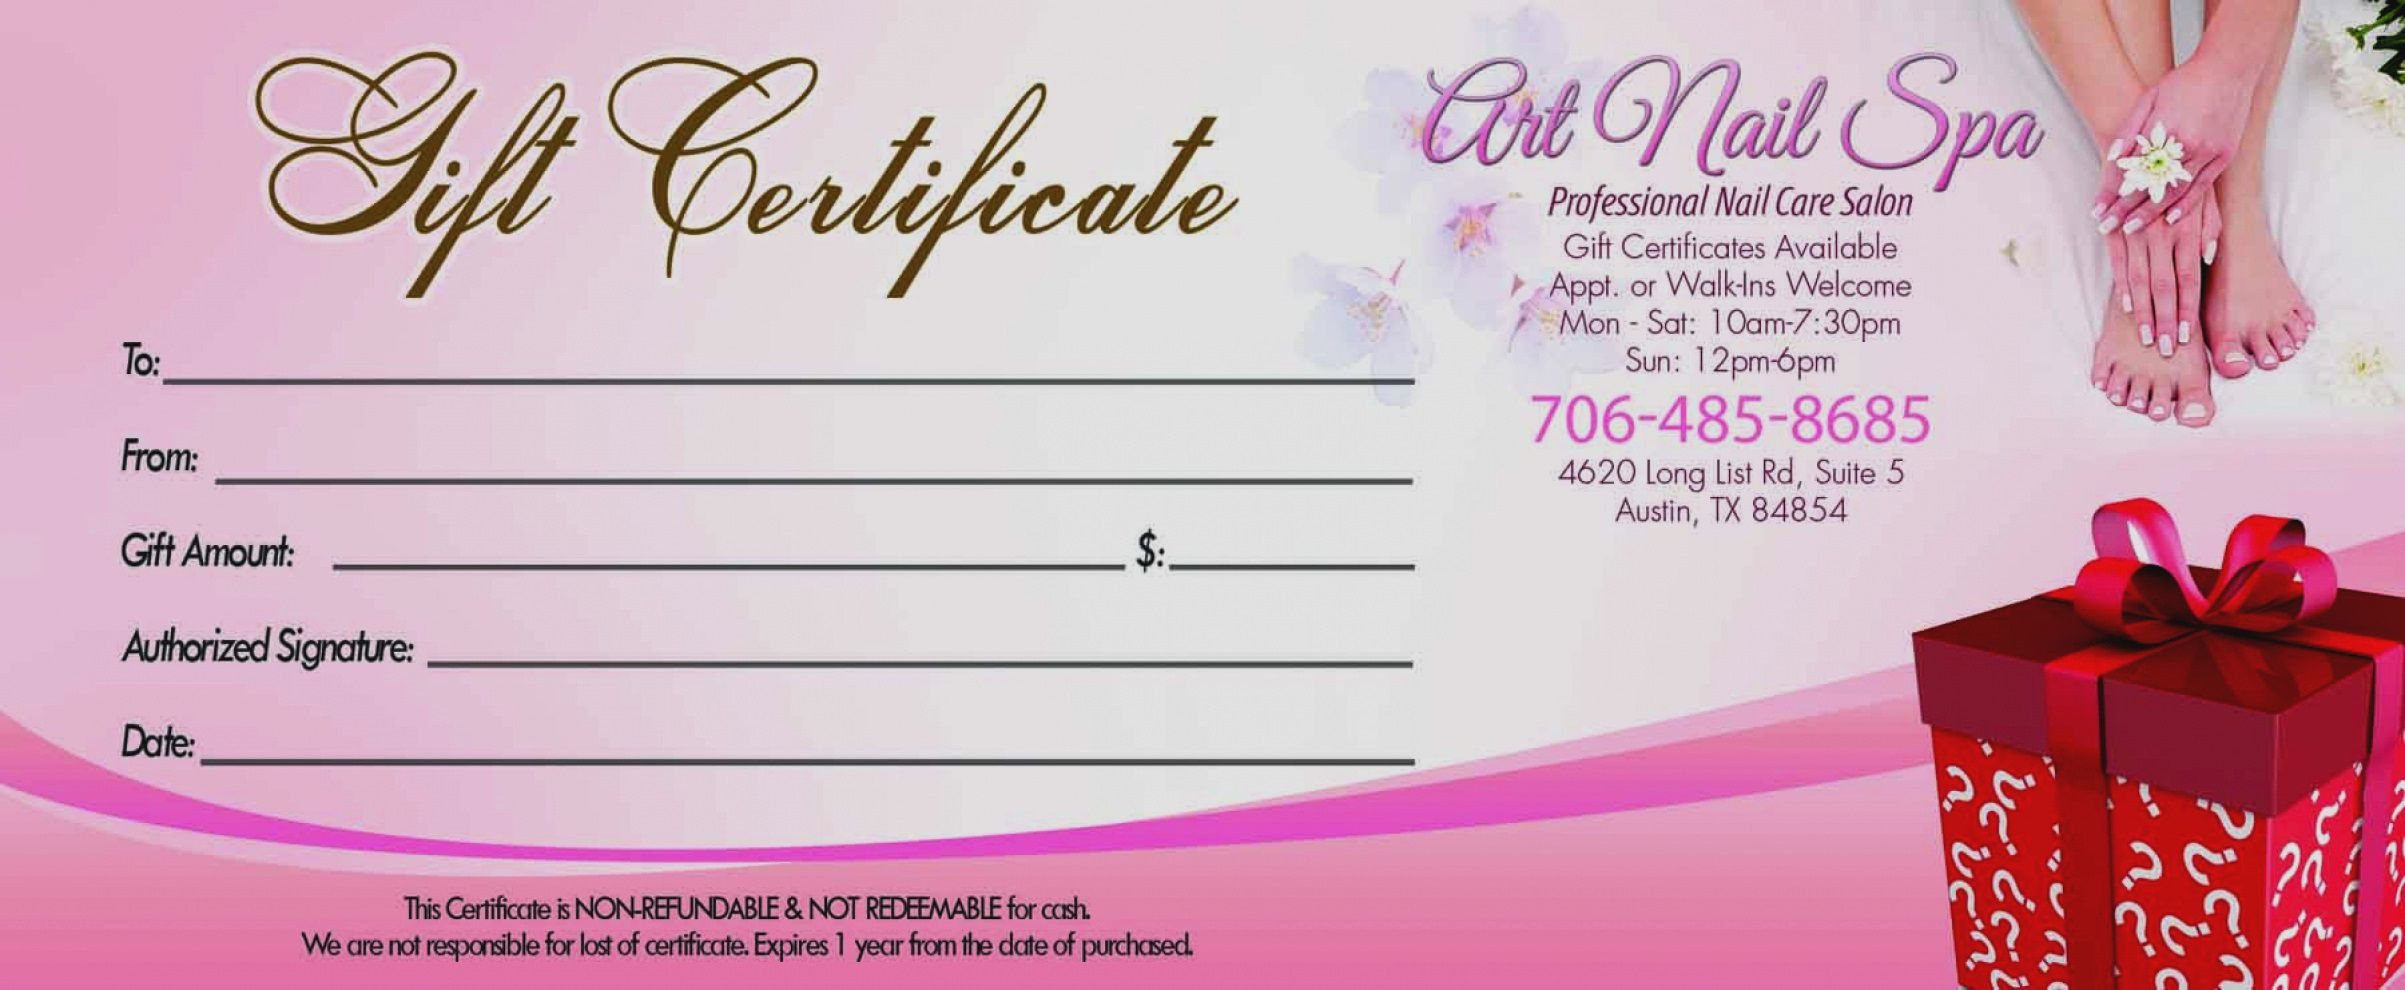 002 Fantastic Salon Gift Certificate Template Image  TemplatesFull